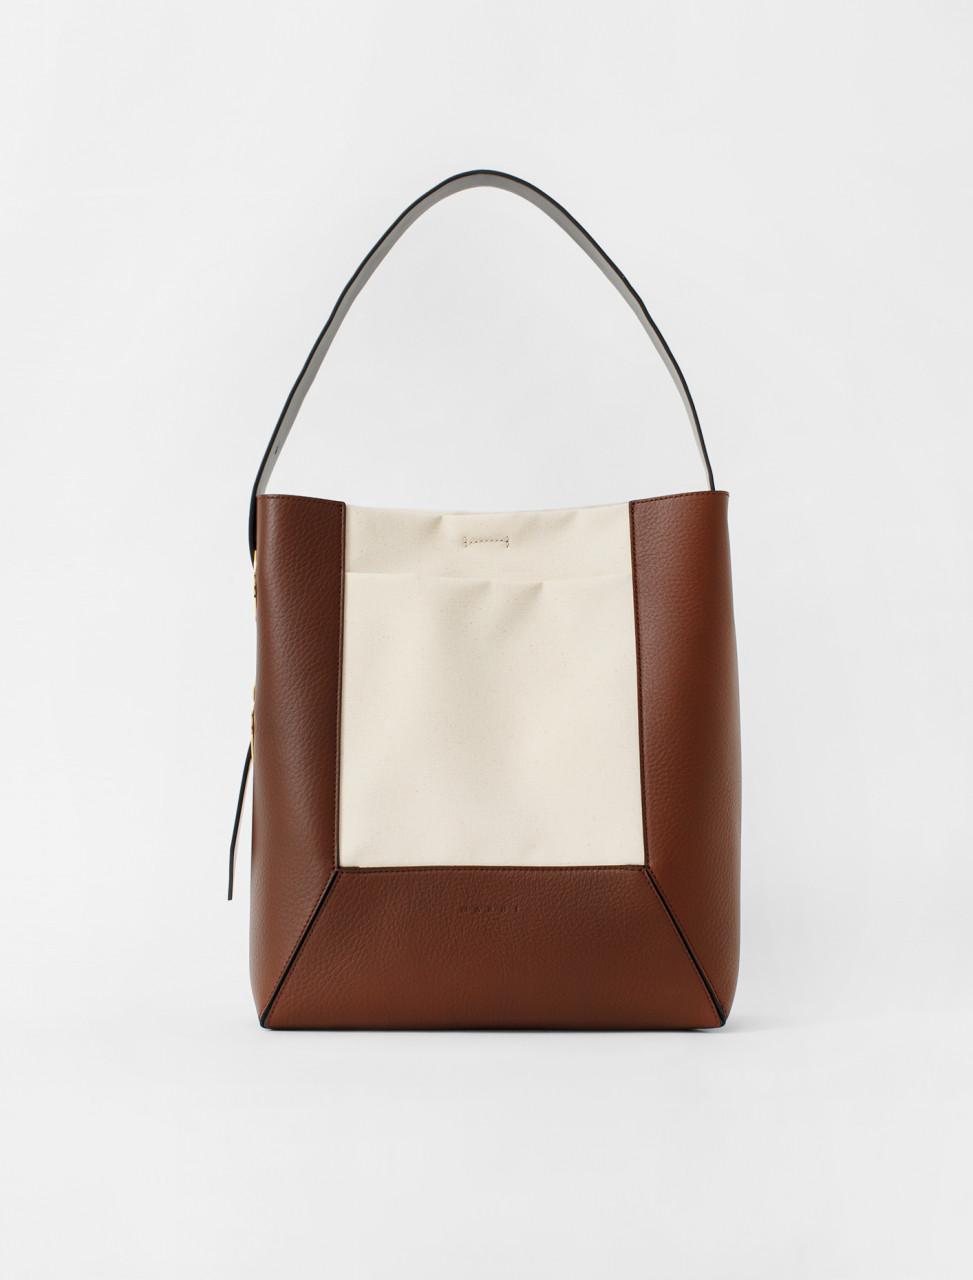 Nemo Shoulder Bag